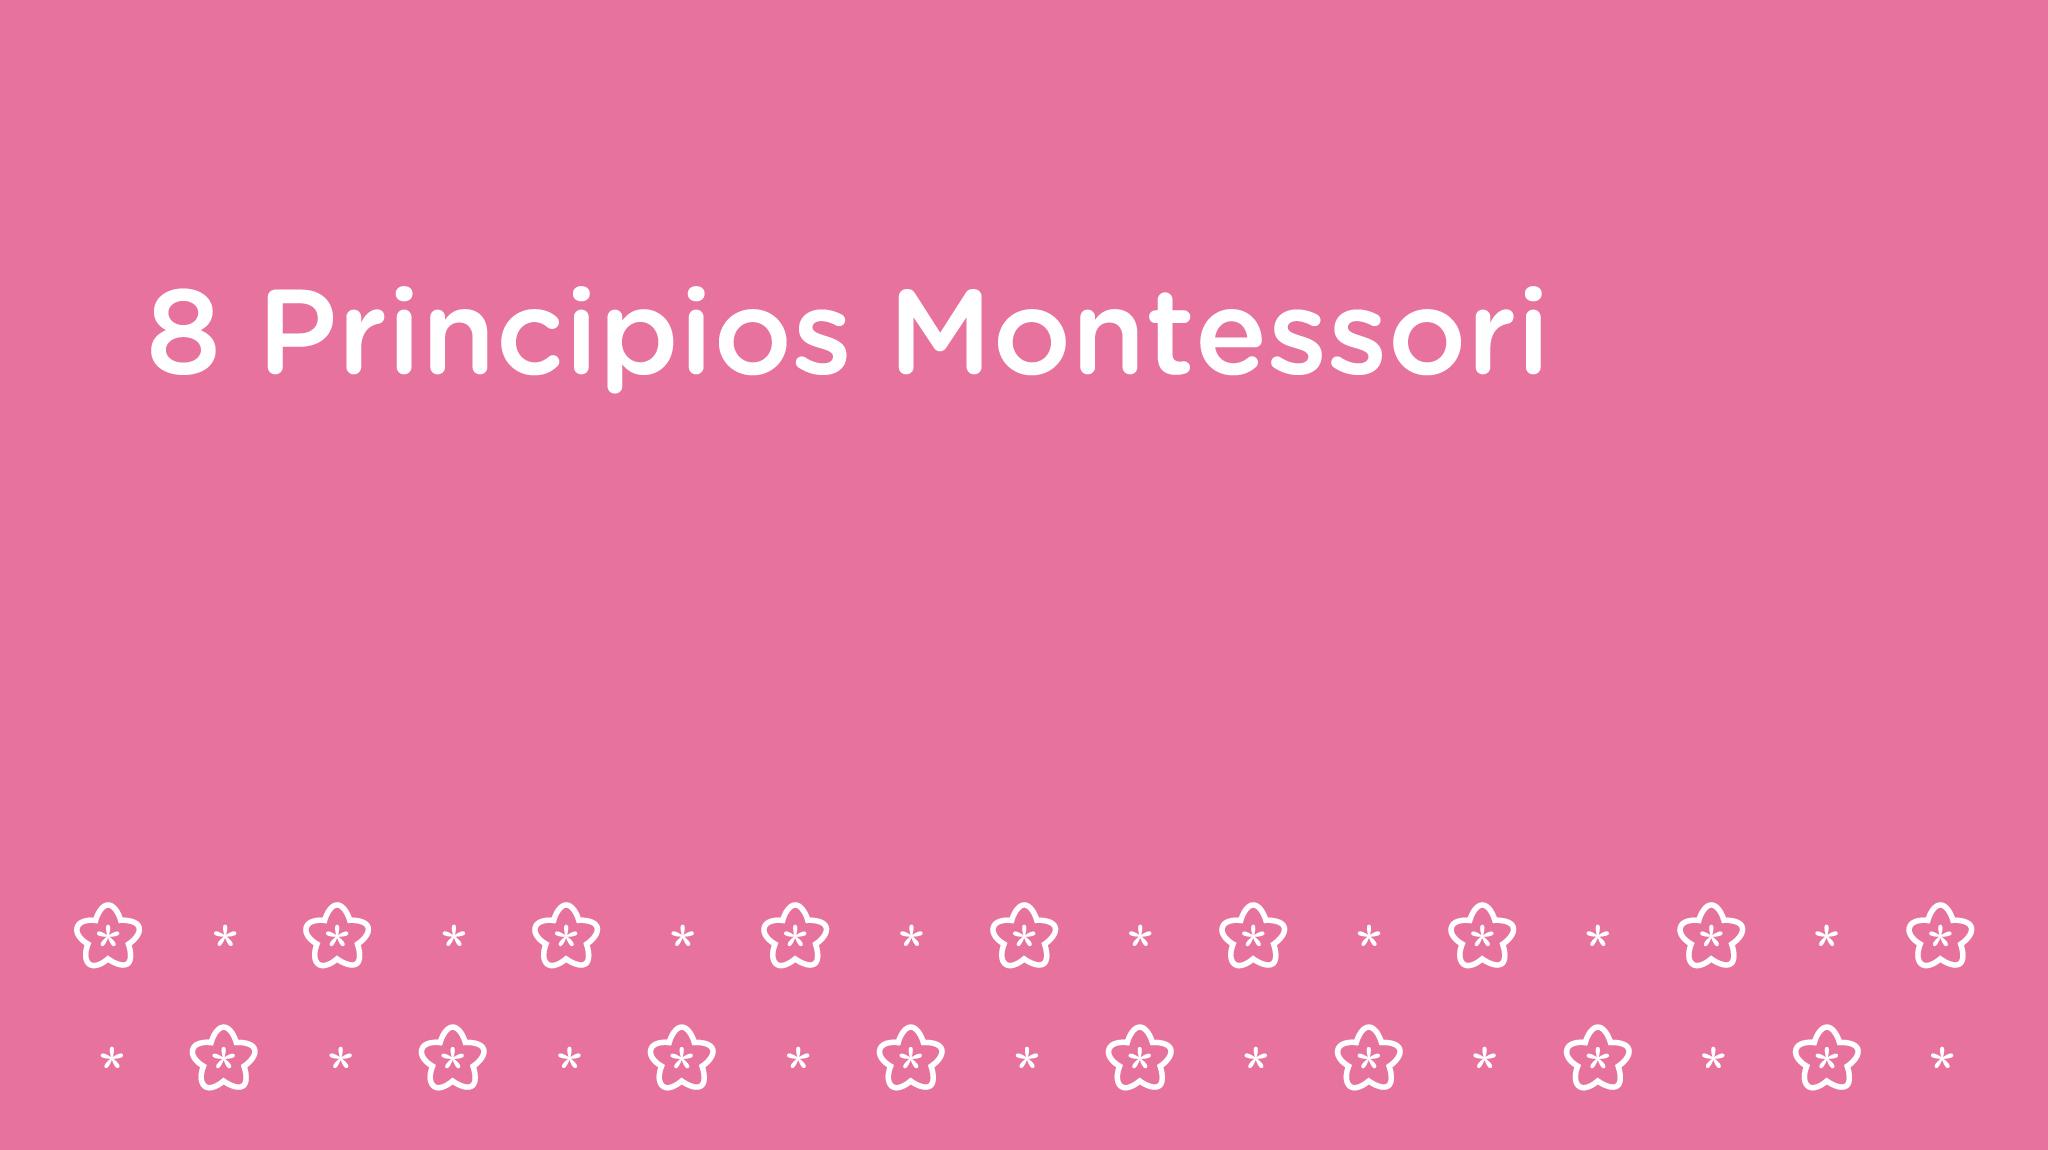 8 Principios Montessori